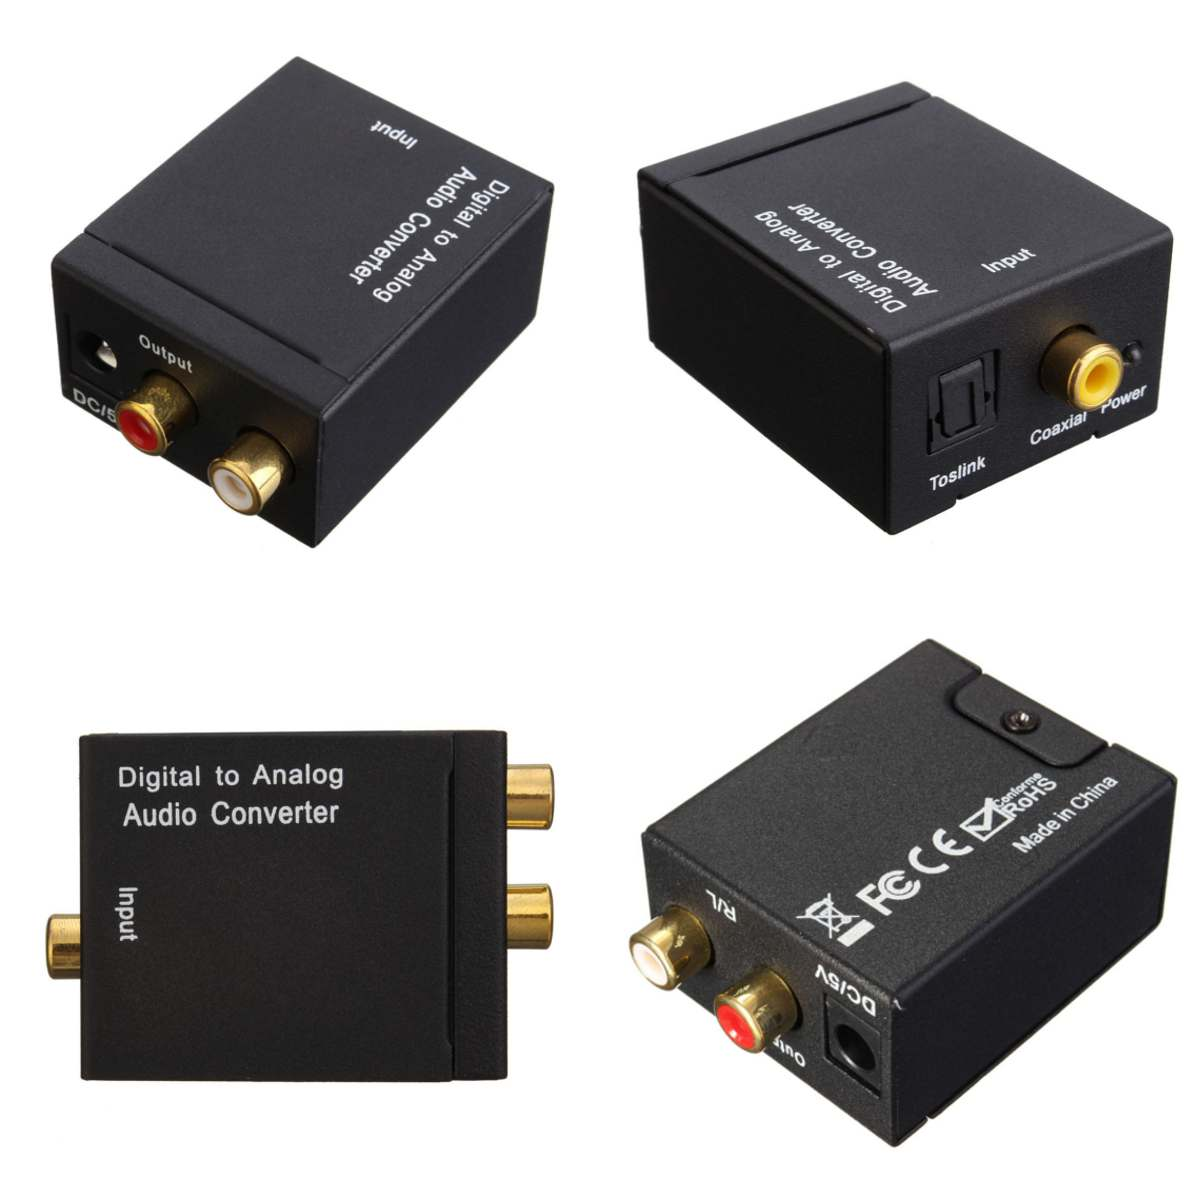 Leory 5 V Digital Zu Analog L/r Spdif Koaxial Coax Rca & Optische Toslink Audio Converter Großhandel Neue Ankunft Tragbares Audio & Video Digital-analog-wandler